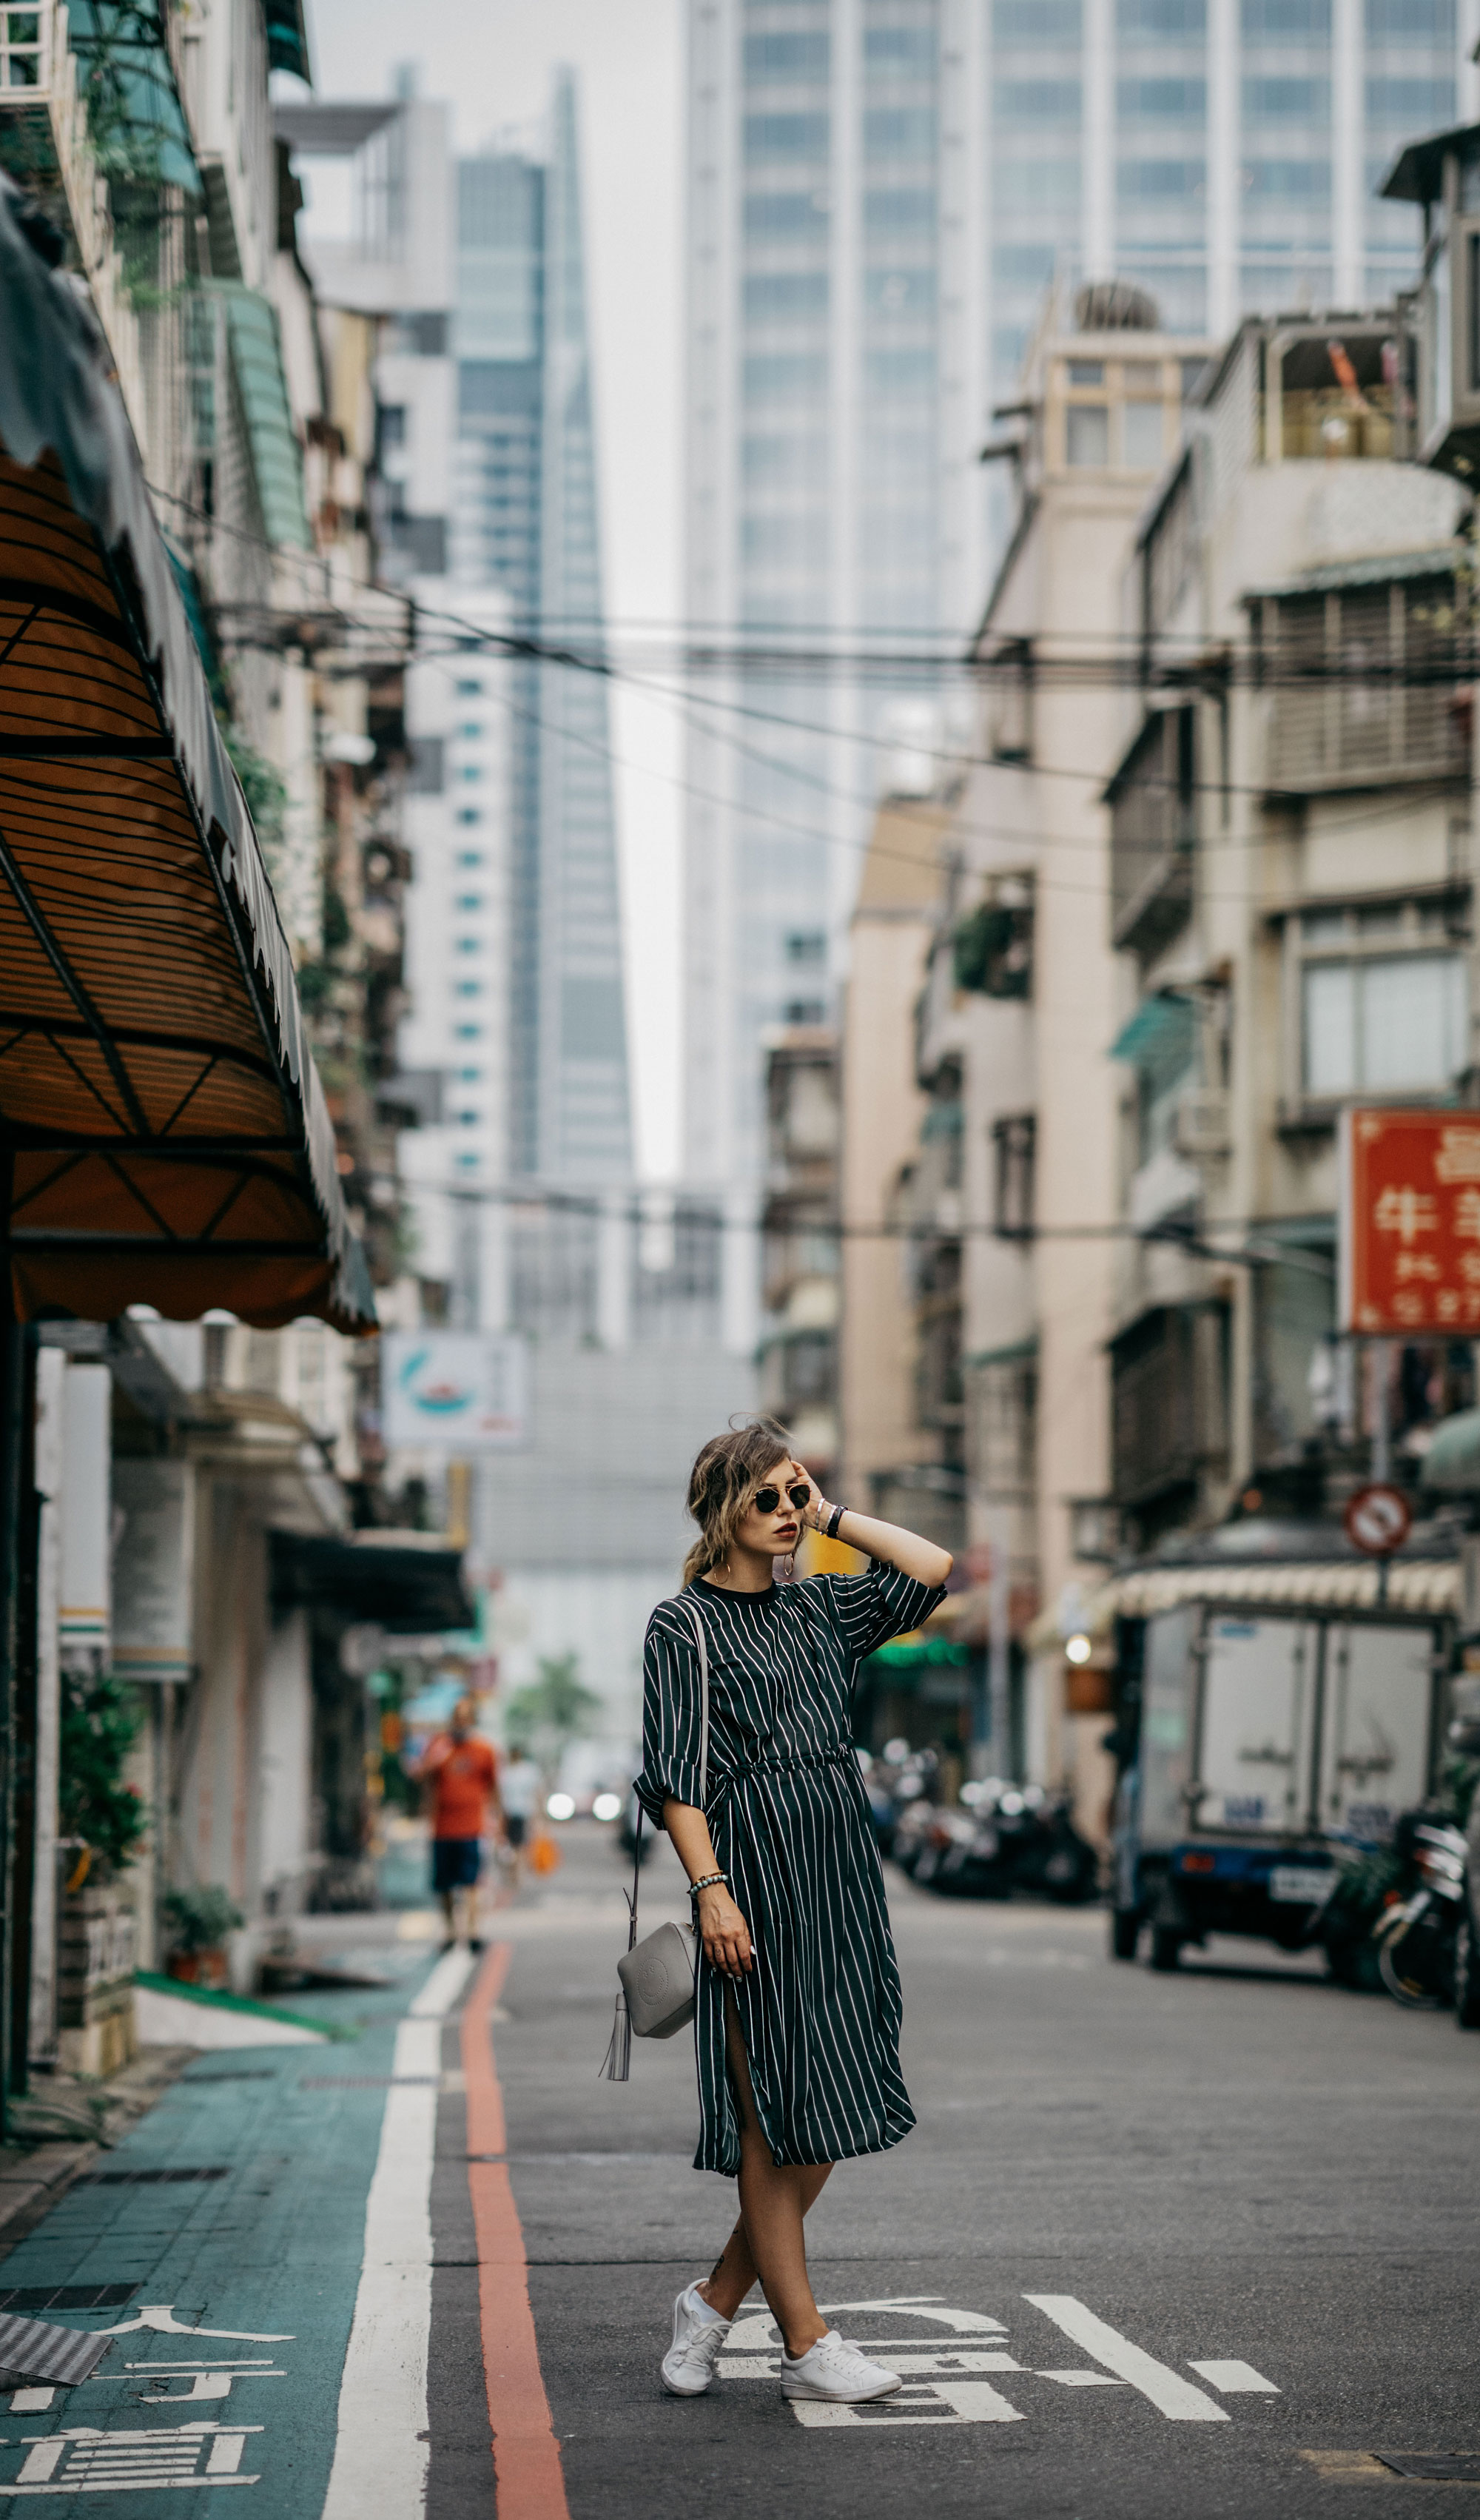 Street Style in Taipei, Taiwan | style: metropolitan, sporty, tennis, asian, edgy